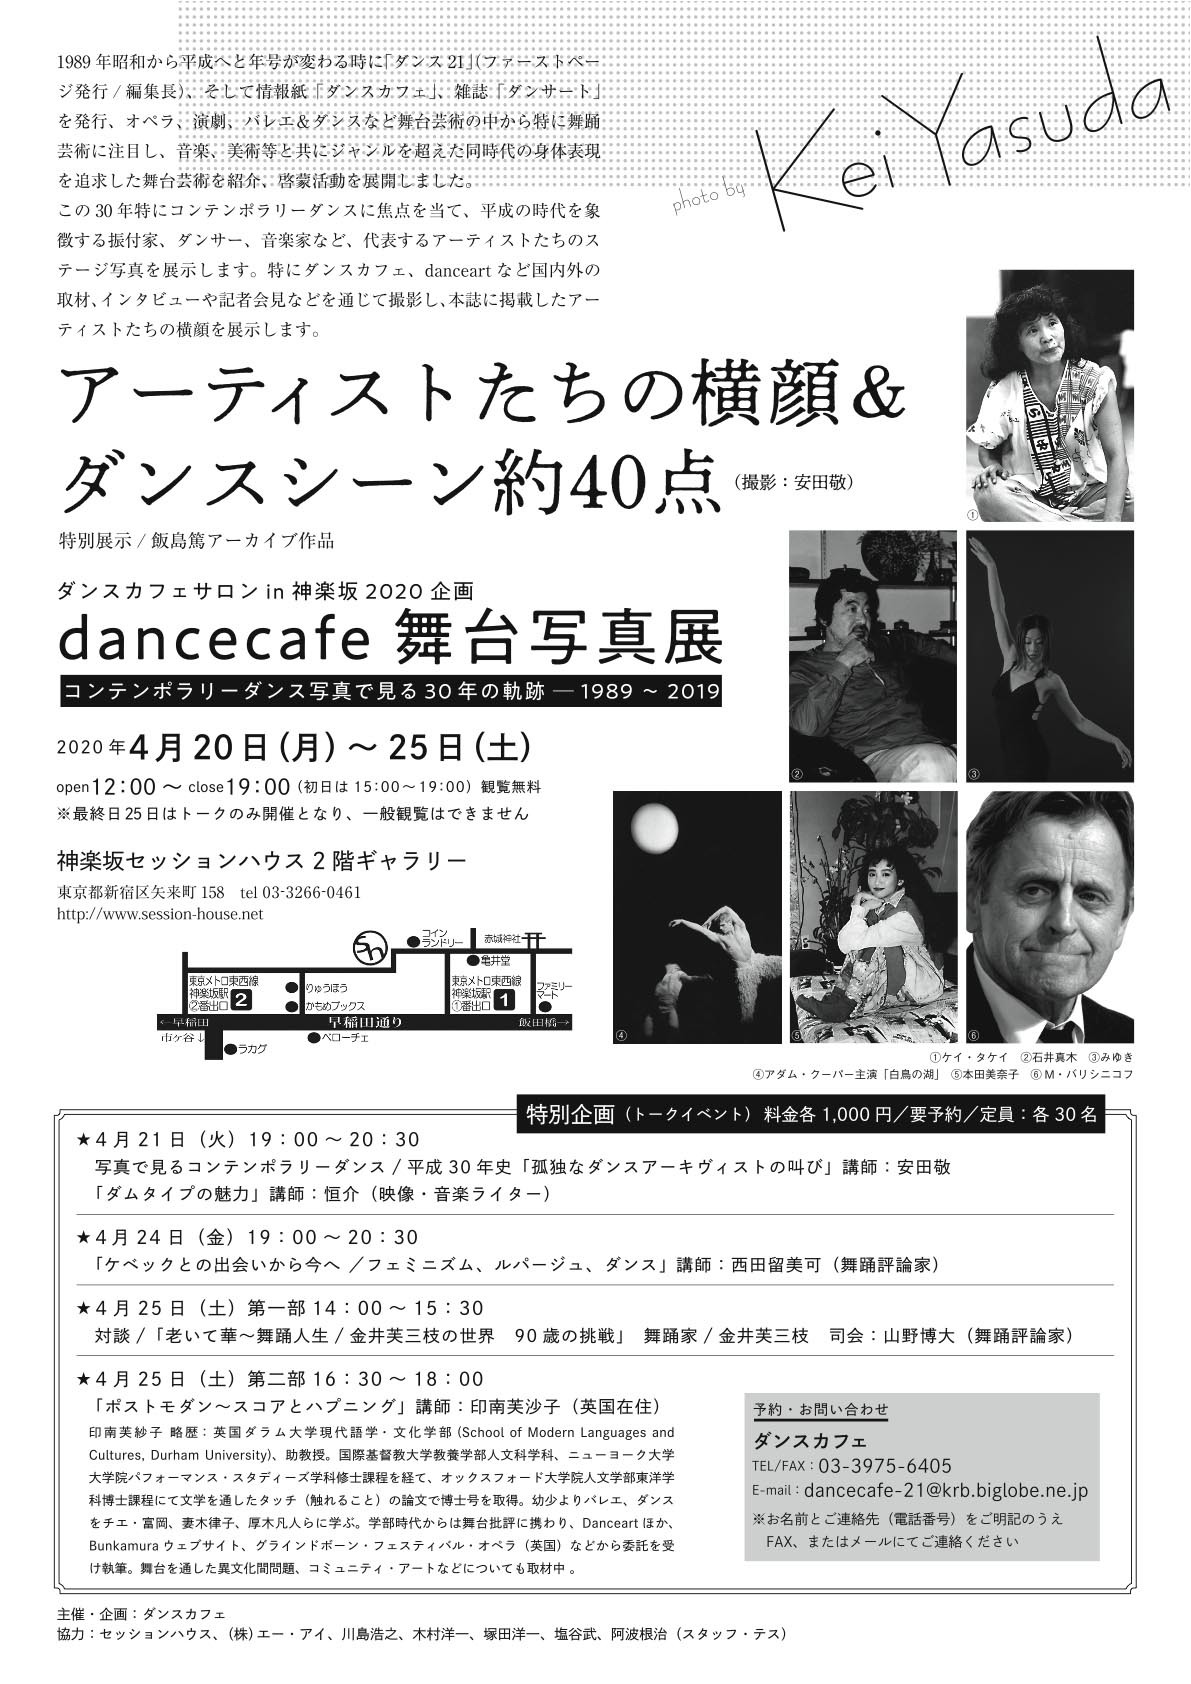 dance_cafe2